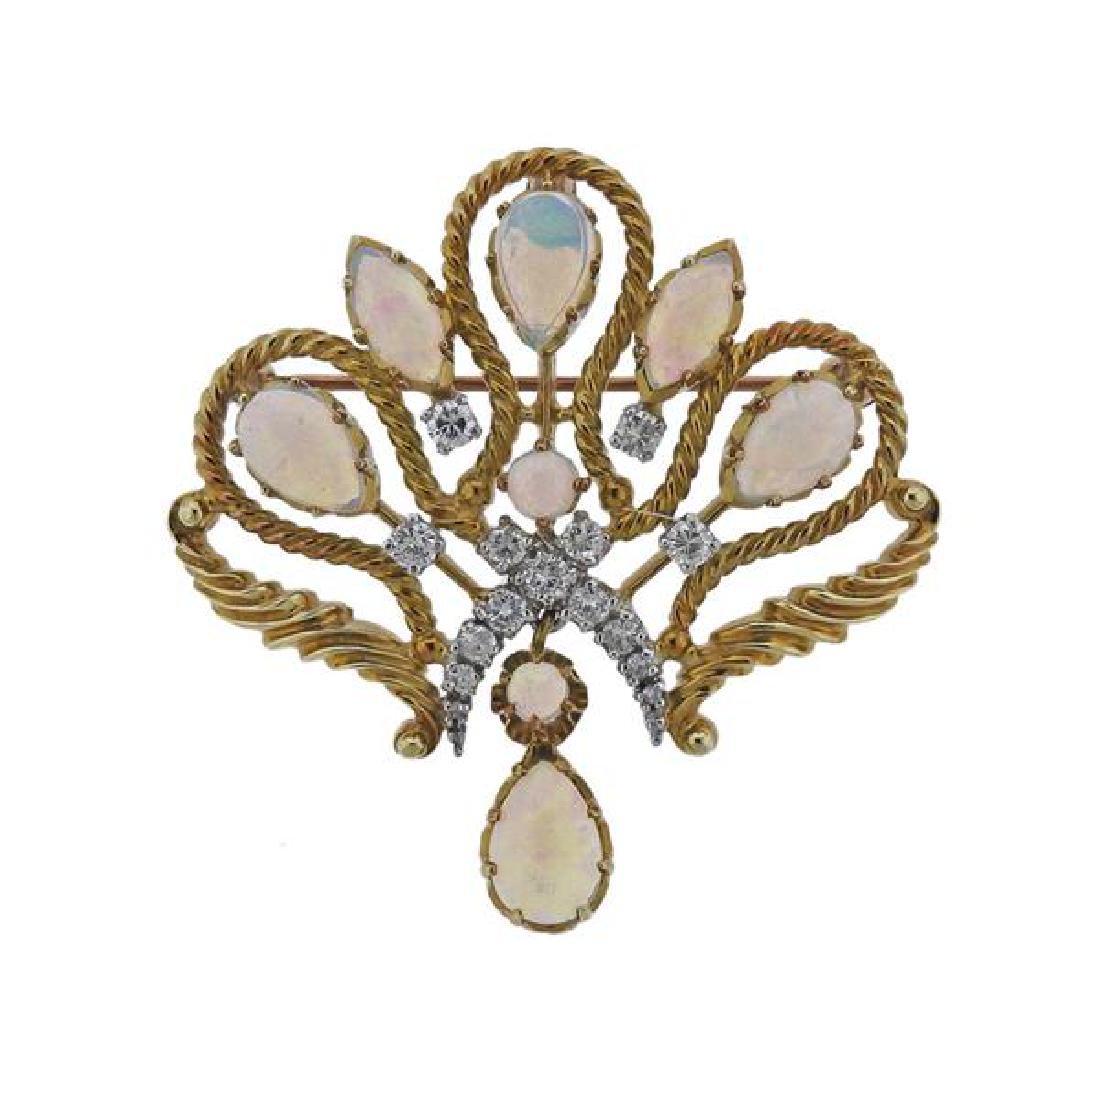 14K Gold Diamond Opal Pendant Brooch